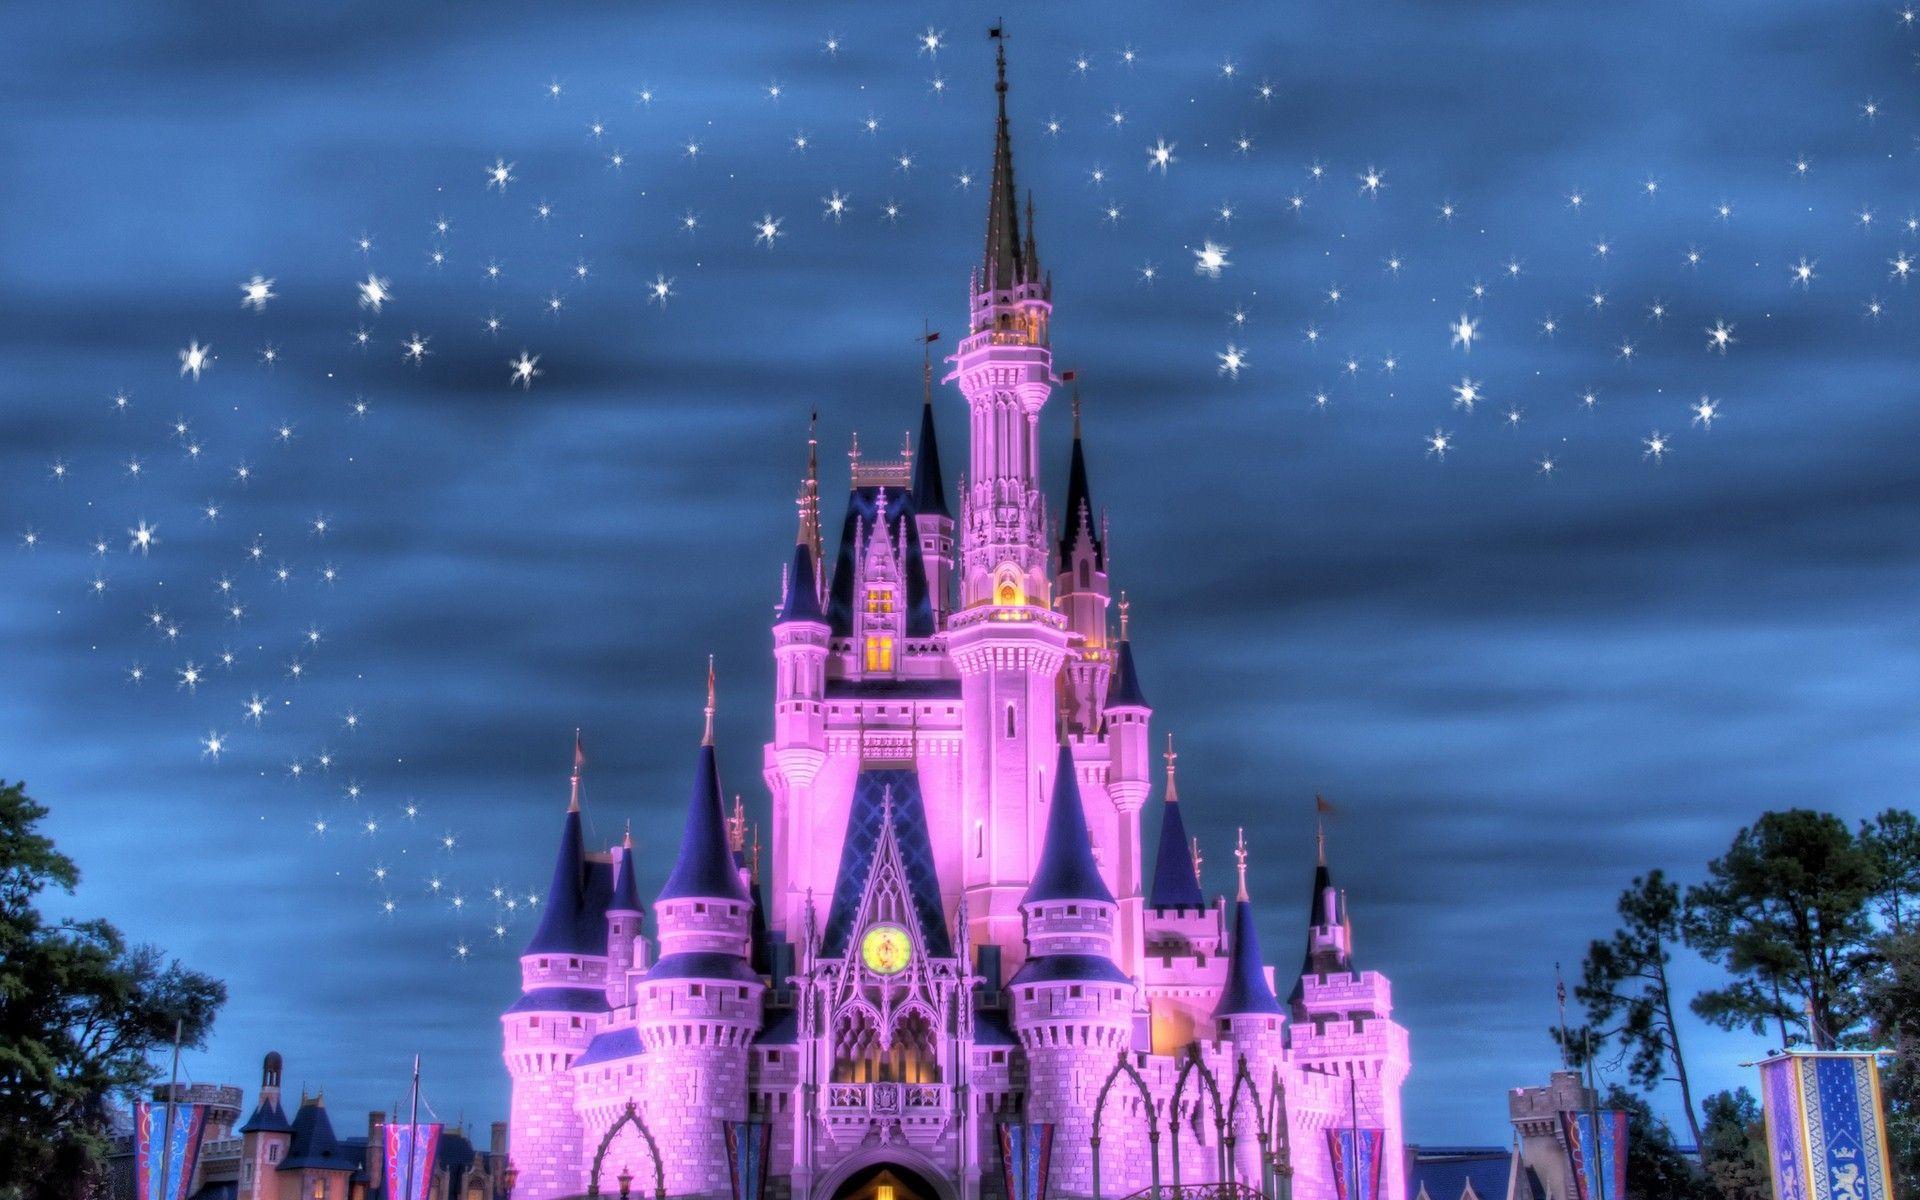 Disney Castle Backgrounds Latar Belakang Disney Voyage